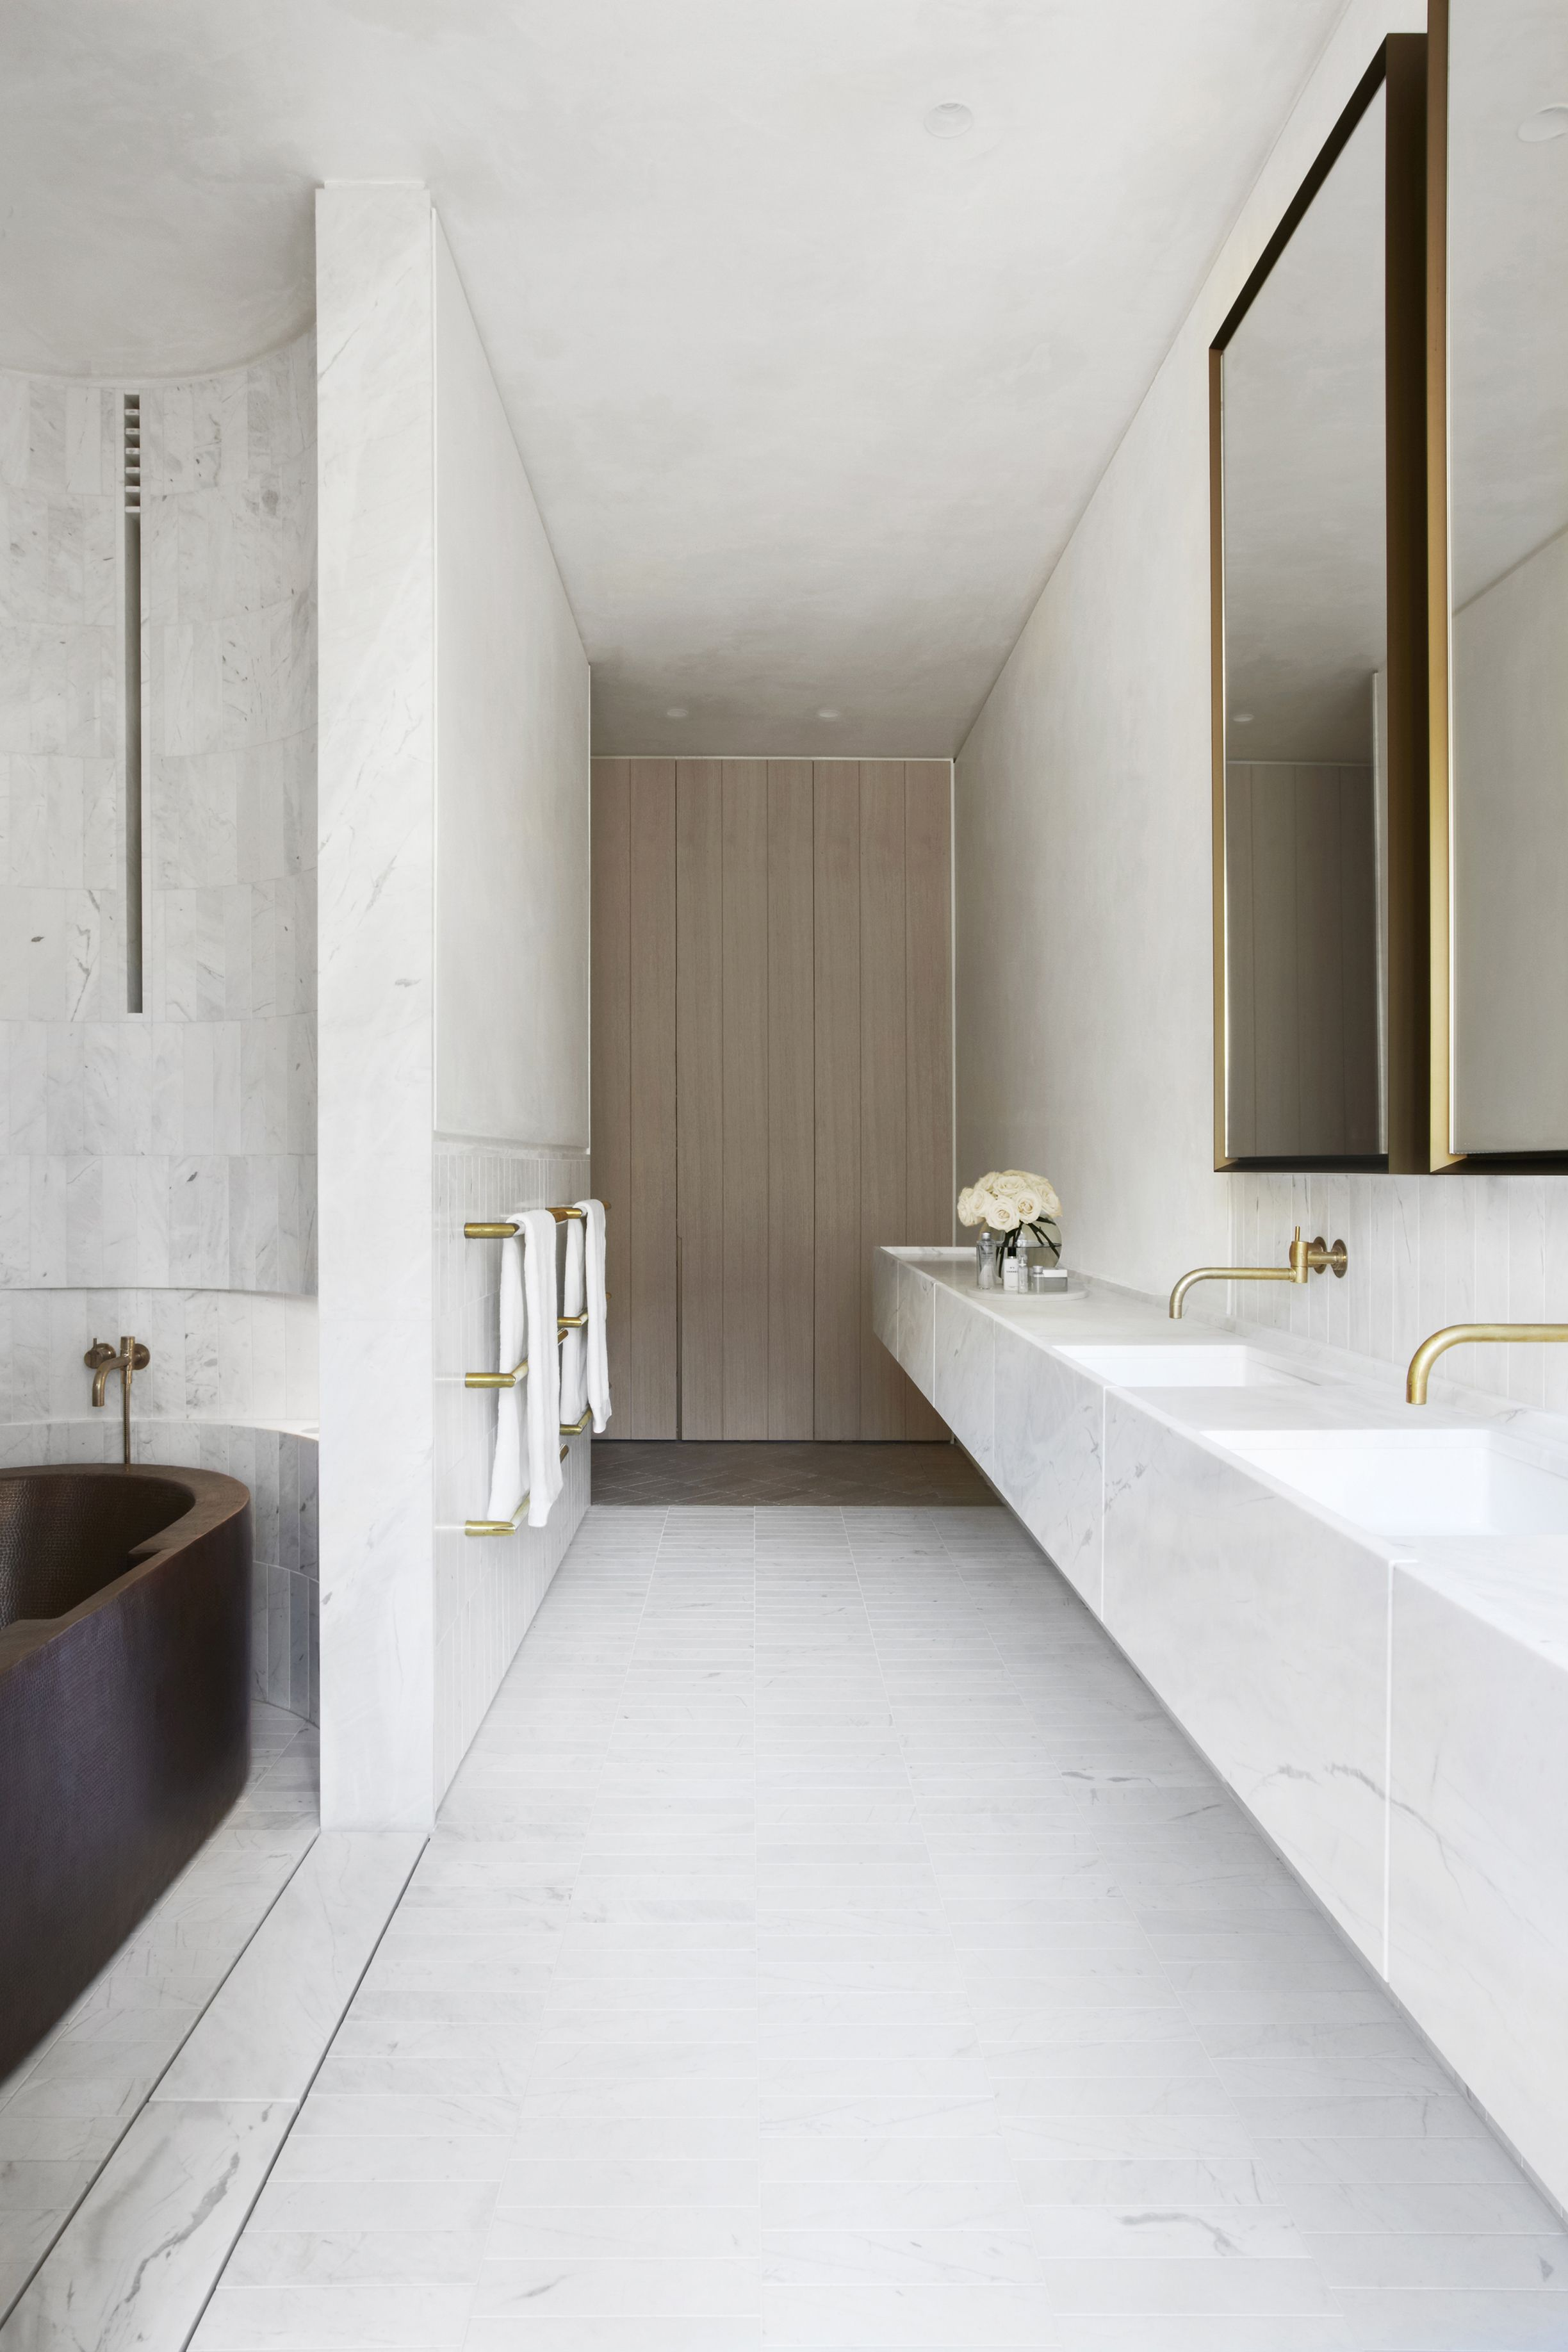 Salle De Bain Waterloo ~ indigo slam waterloo pinterest salle de bains salle et sdb